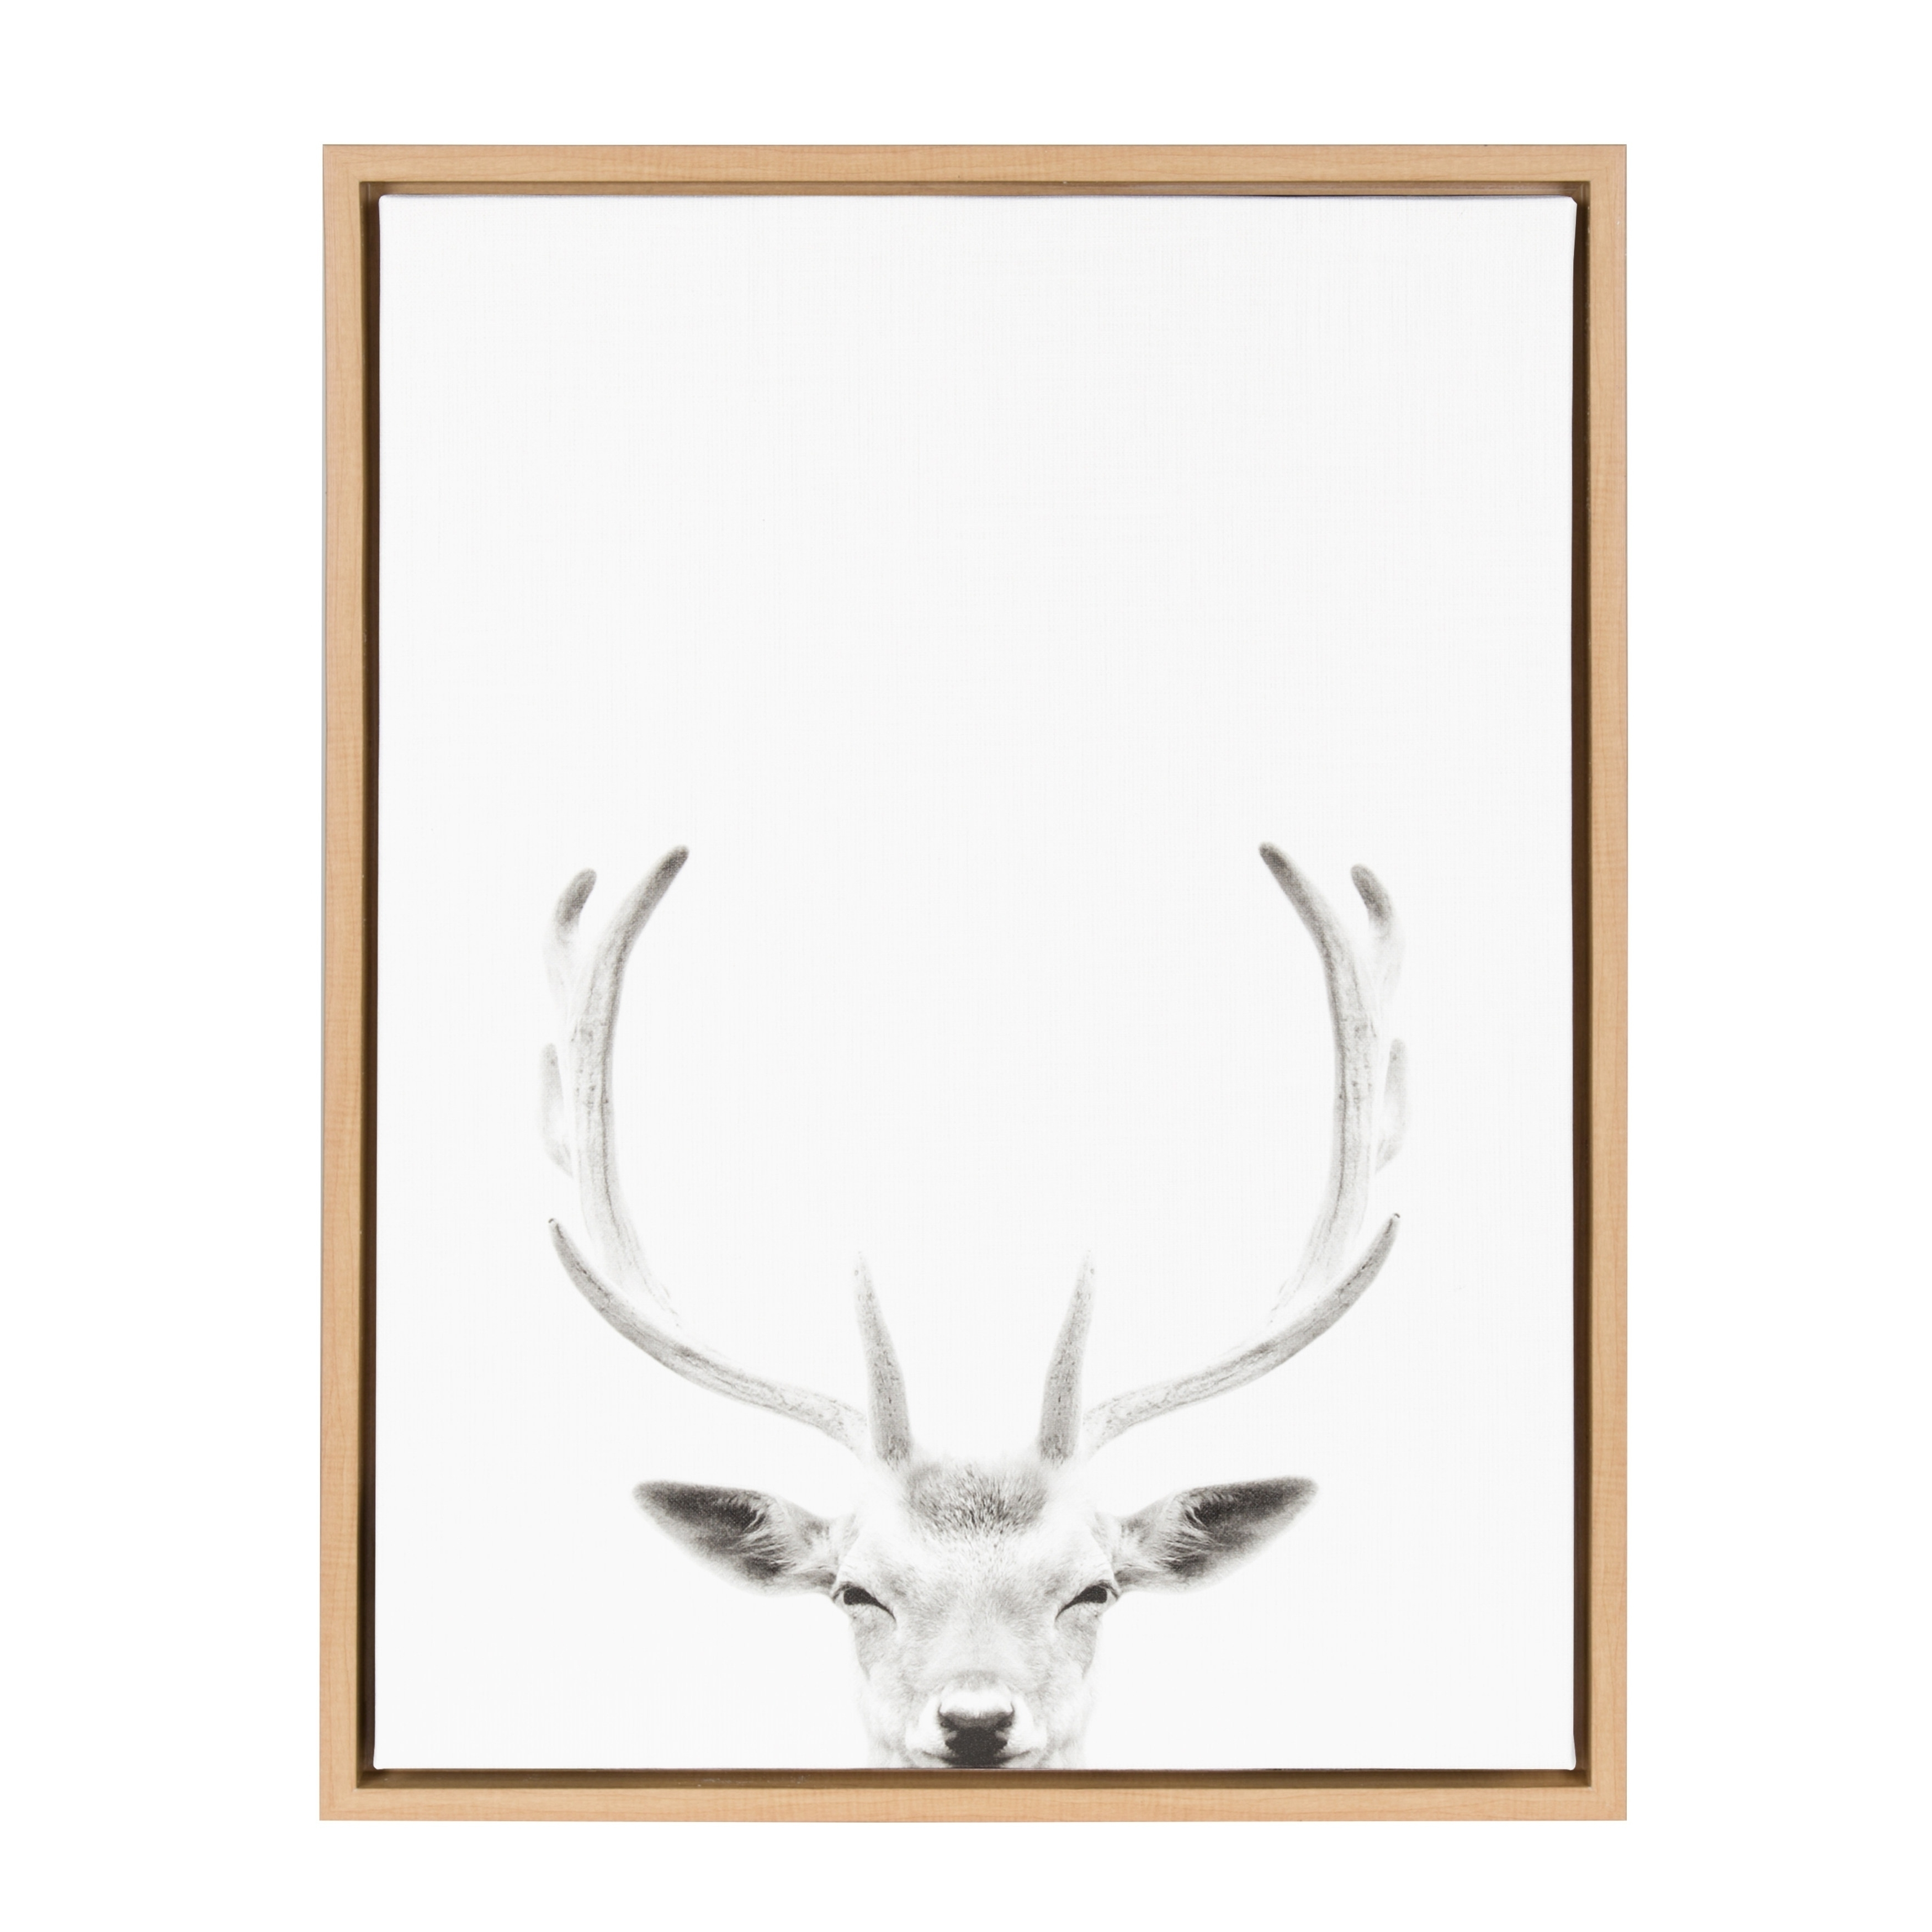 2017 Shop Sylvie Deer Portrait 18X24 Natural Framed Canvas Wall Art Within Deer Canvas Wall Art (View 1 of 15)